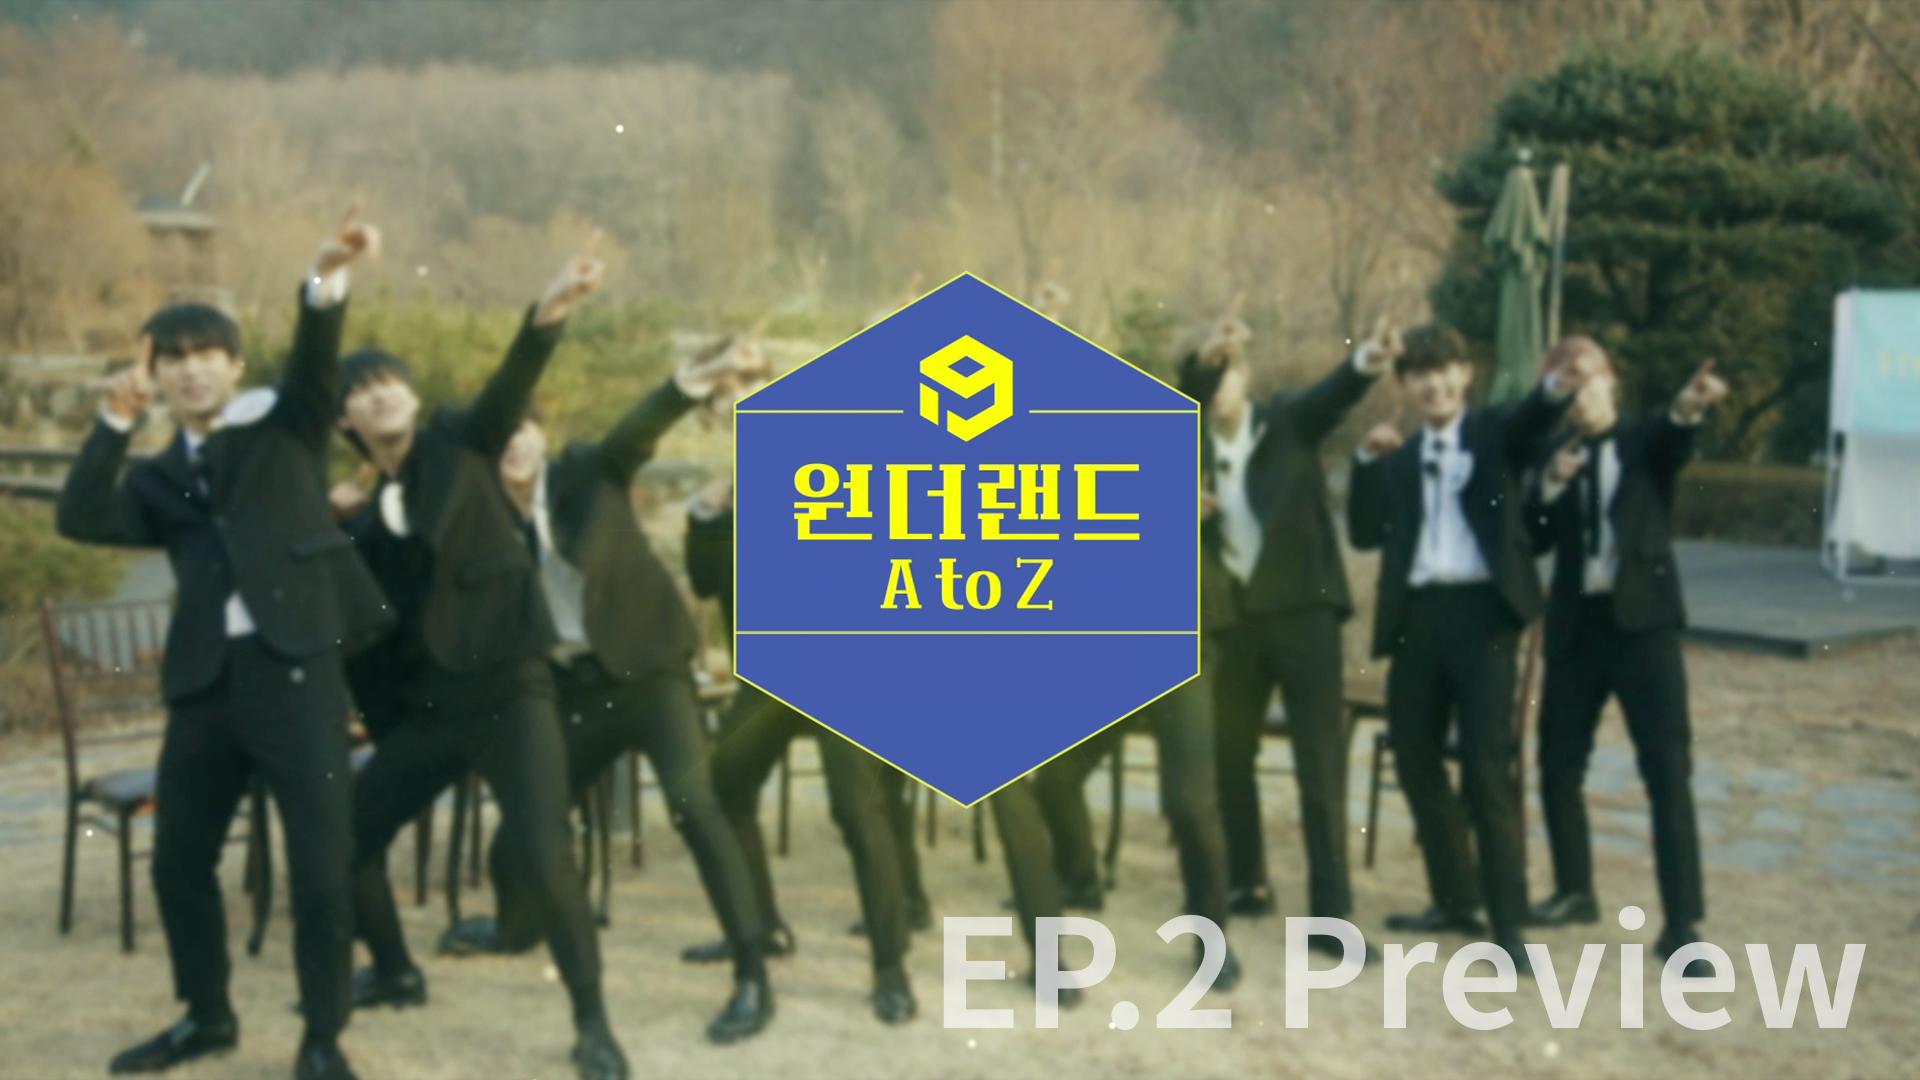 [1THE9]원더나인 - 원더랜드(WONDERLAND) EP.2 Preview